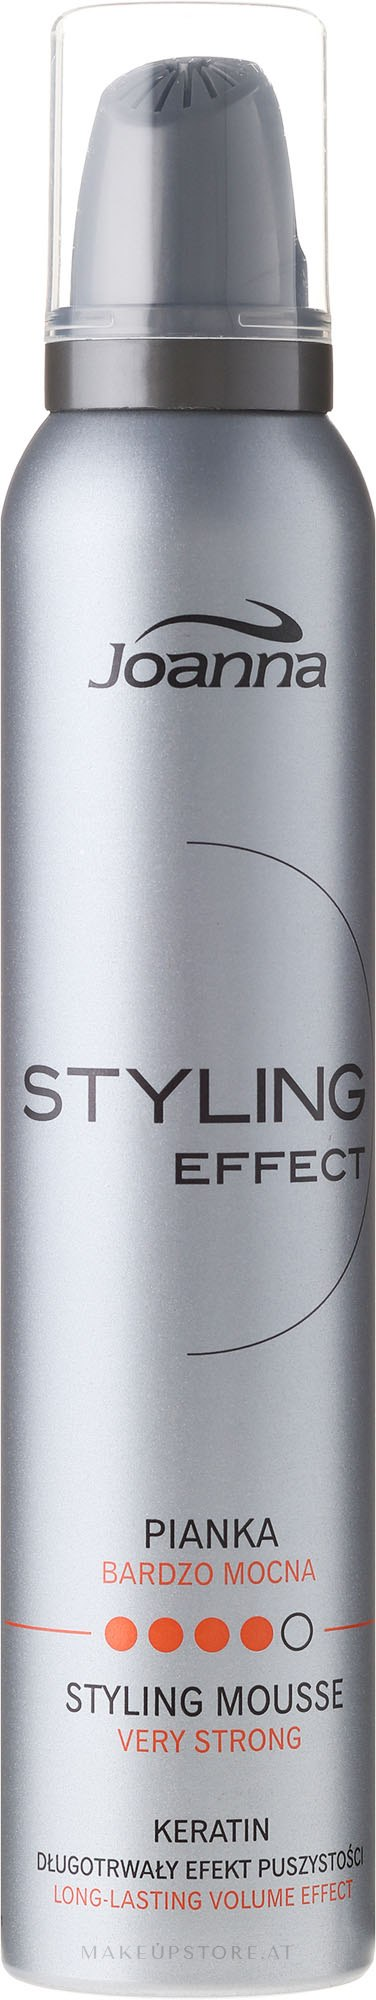 Lockendefinierende Haarmousse mit extra starkem Halt - Joanna Styling Effect Styling Mousse Strong — Bild 150 ml